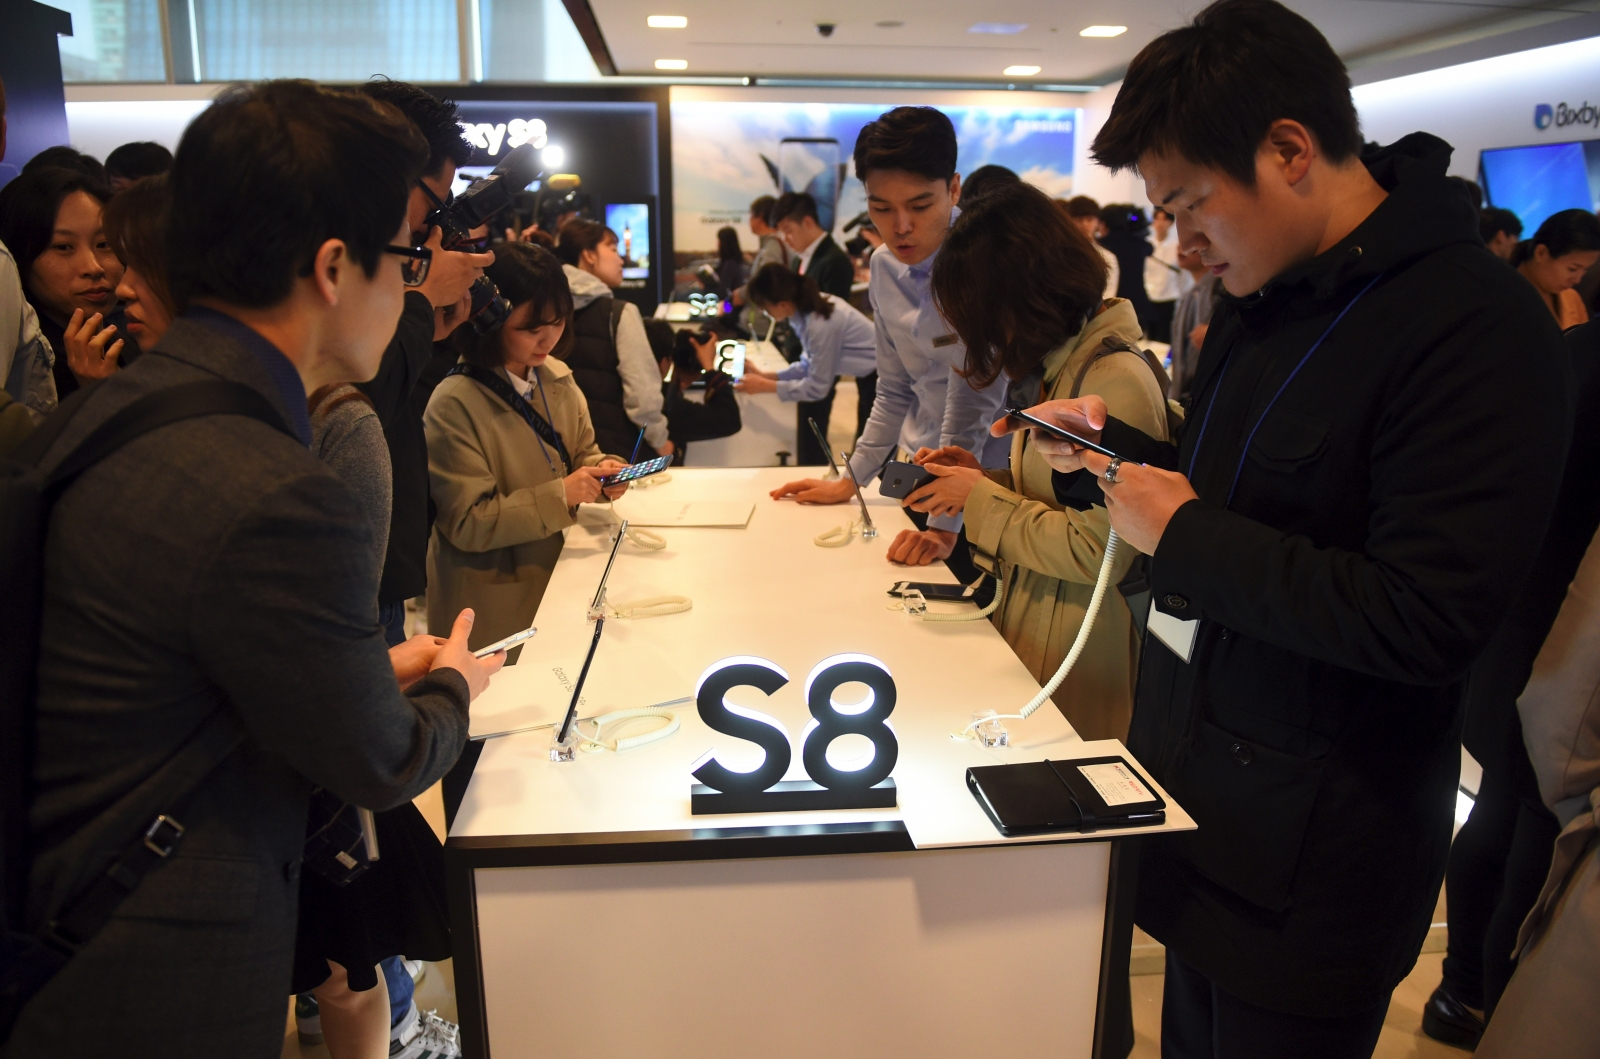 Galaxy S8, S8+ heavy demand in SouthKorea